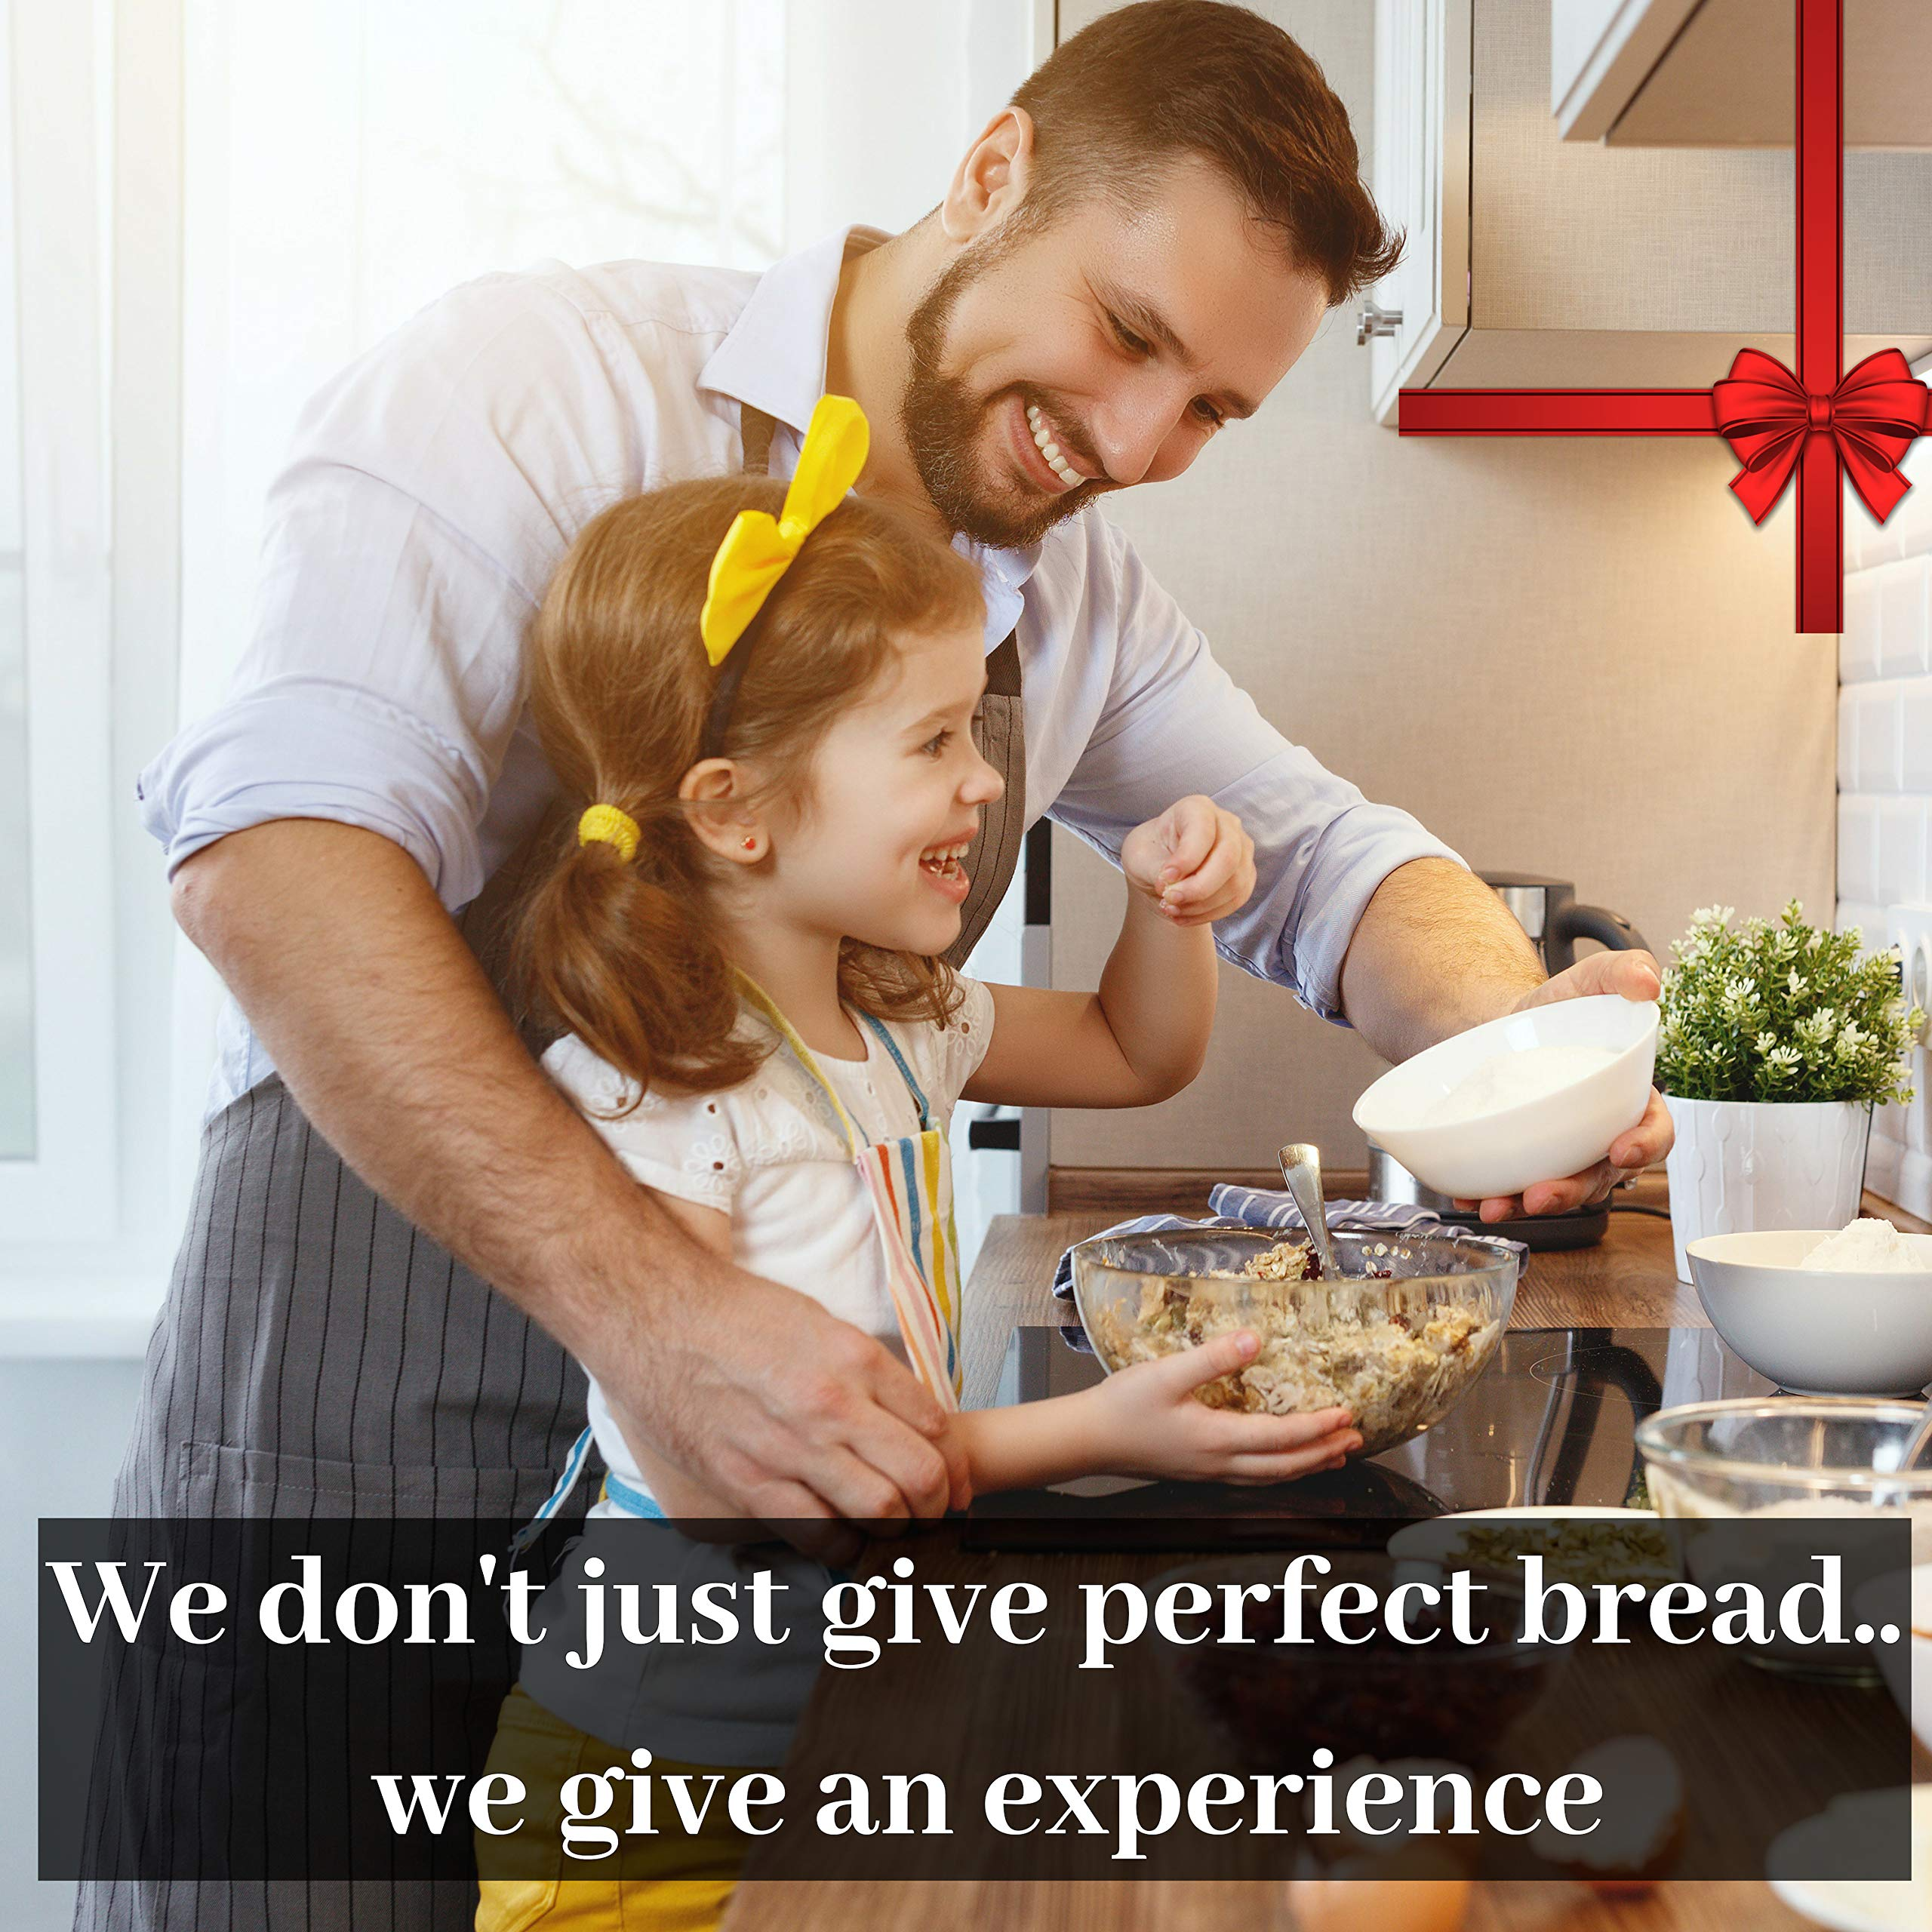 KIT 10 Inch Bread Basket Sourdough Starter - Banneton Proofing Basket, Dough Scraper, Bread Lame, Liner & FREE EBOOK - Bread Proofing Basket for Bread Baking Supplies, Bread Making Tools by PremiumBake (Image #7)